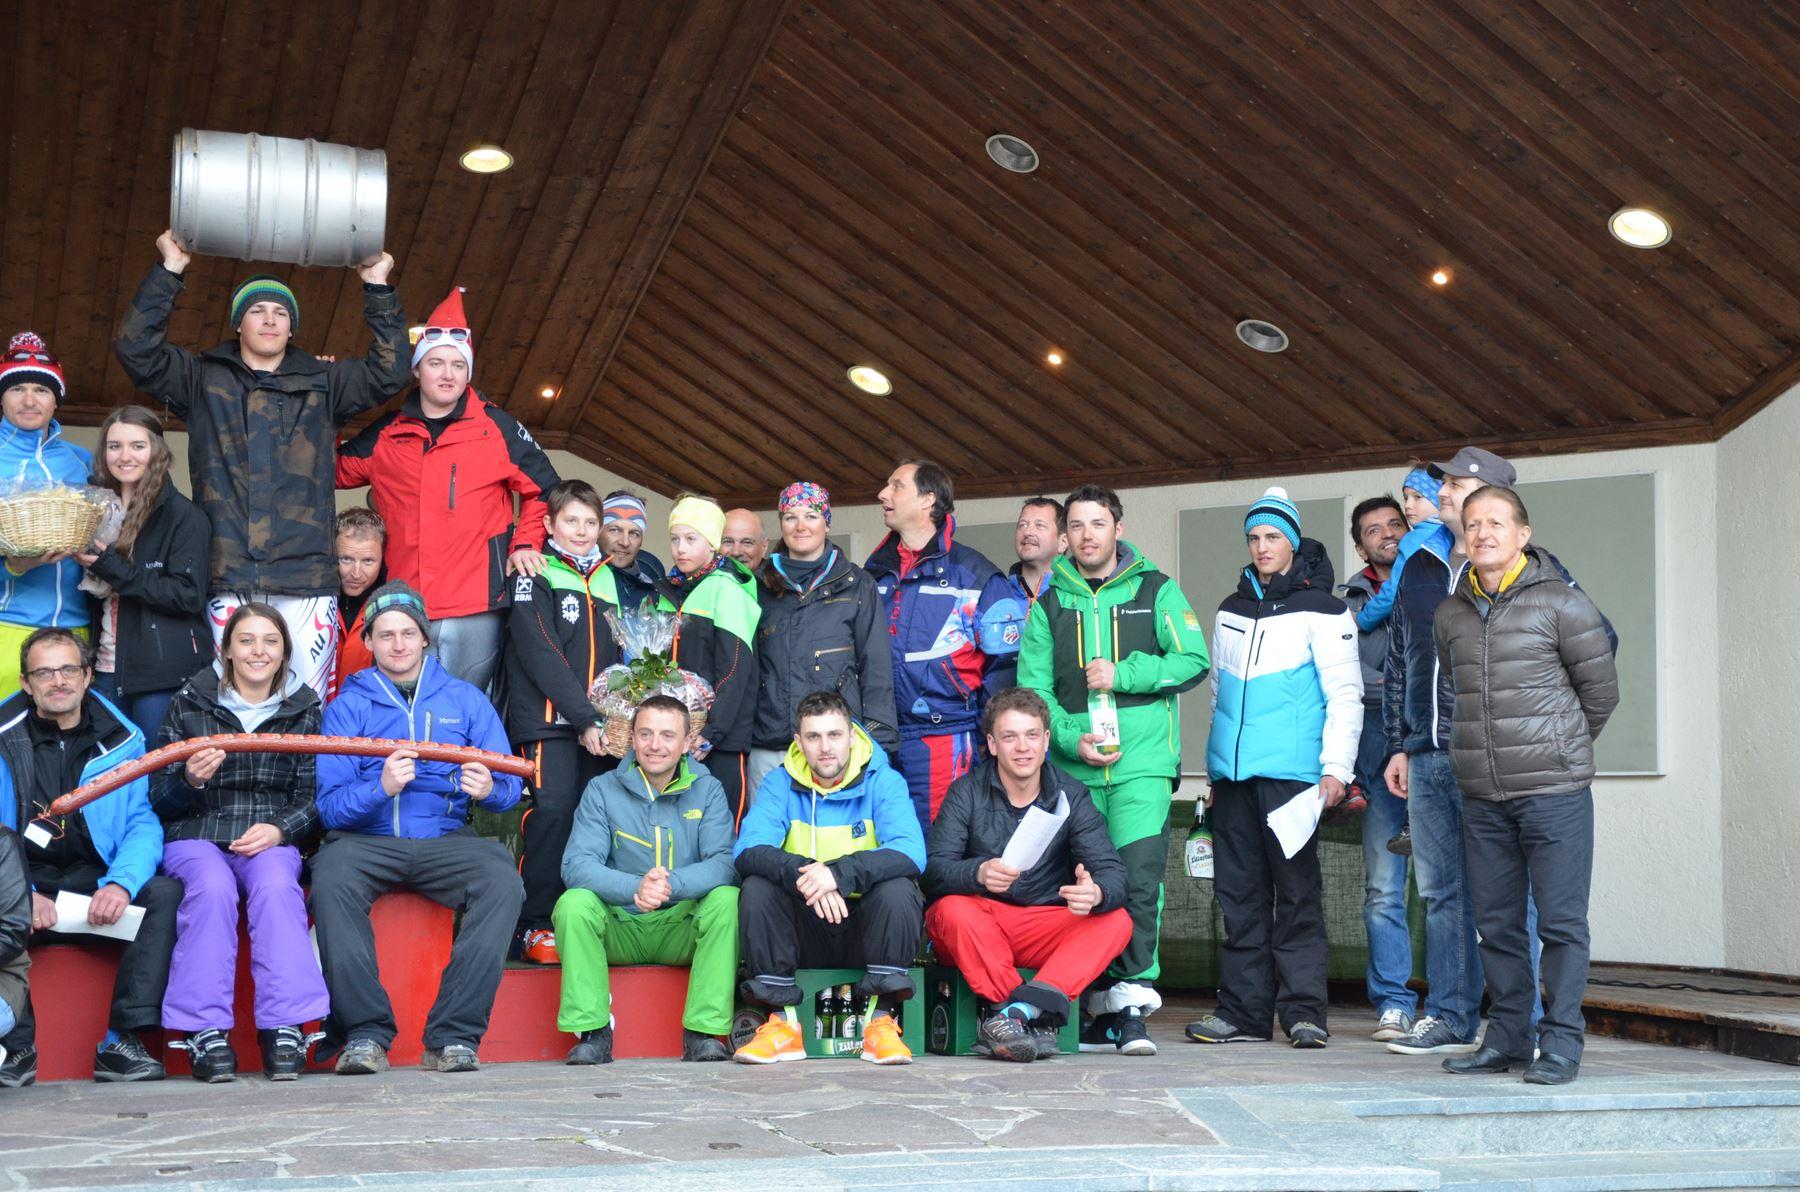 2015-03-22 BV Zillertal Skirennen 580.JPG